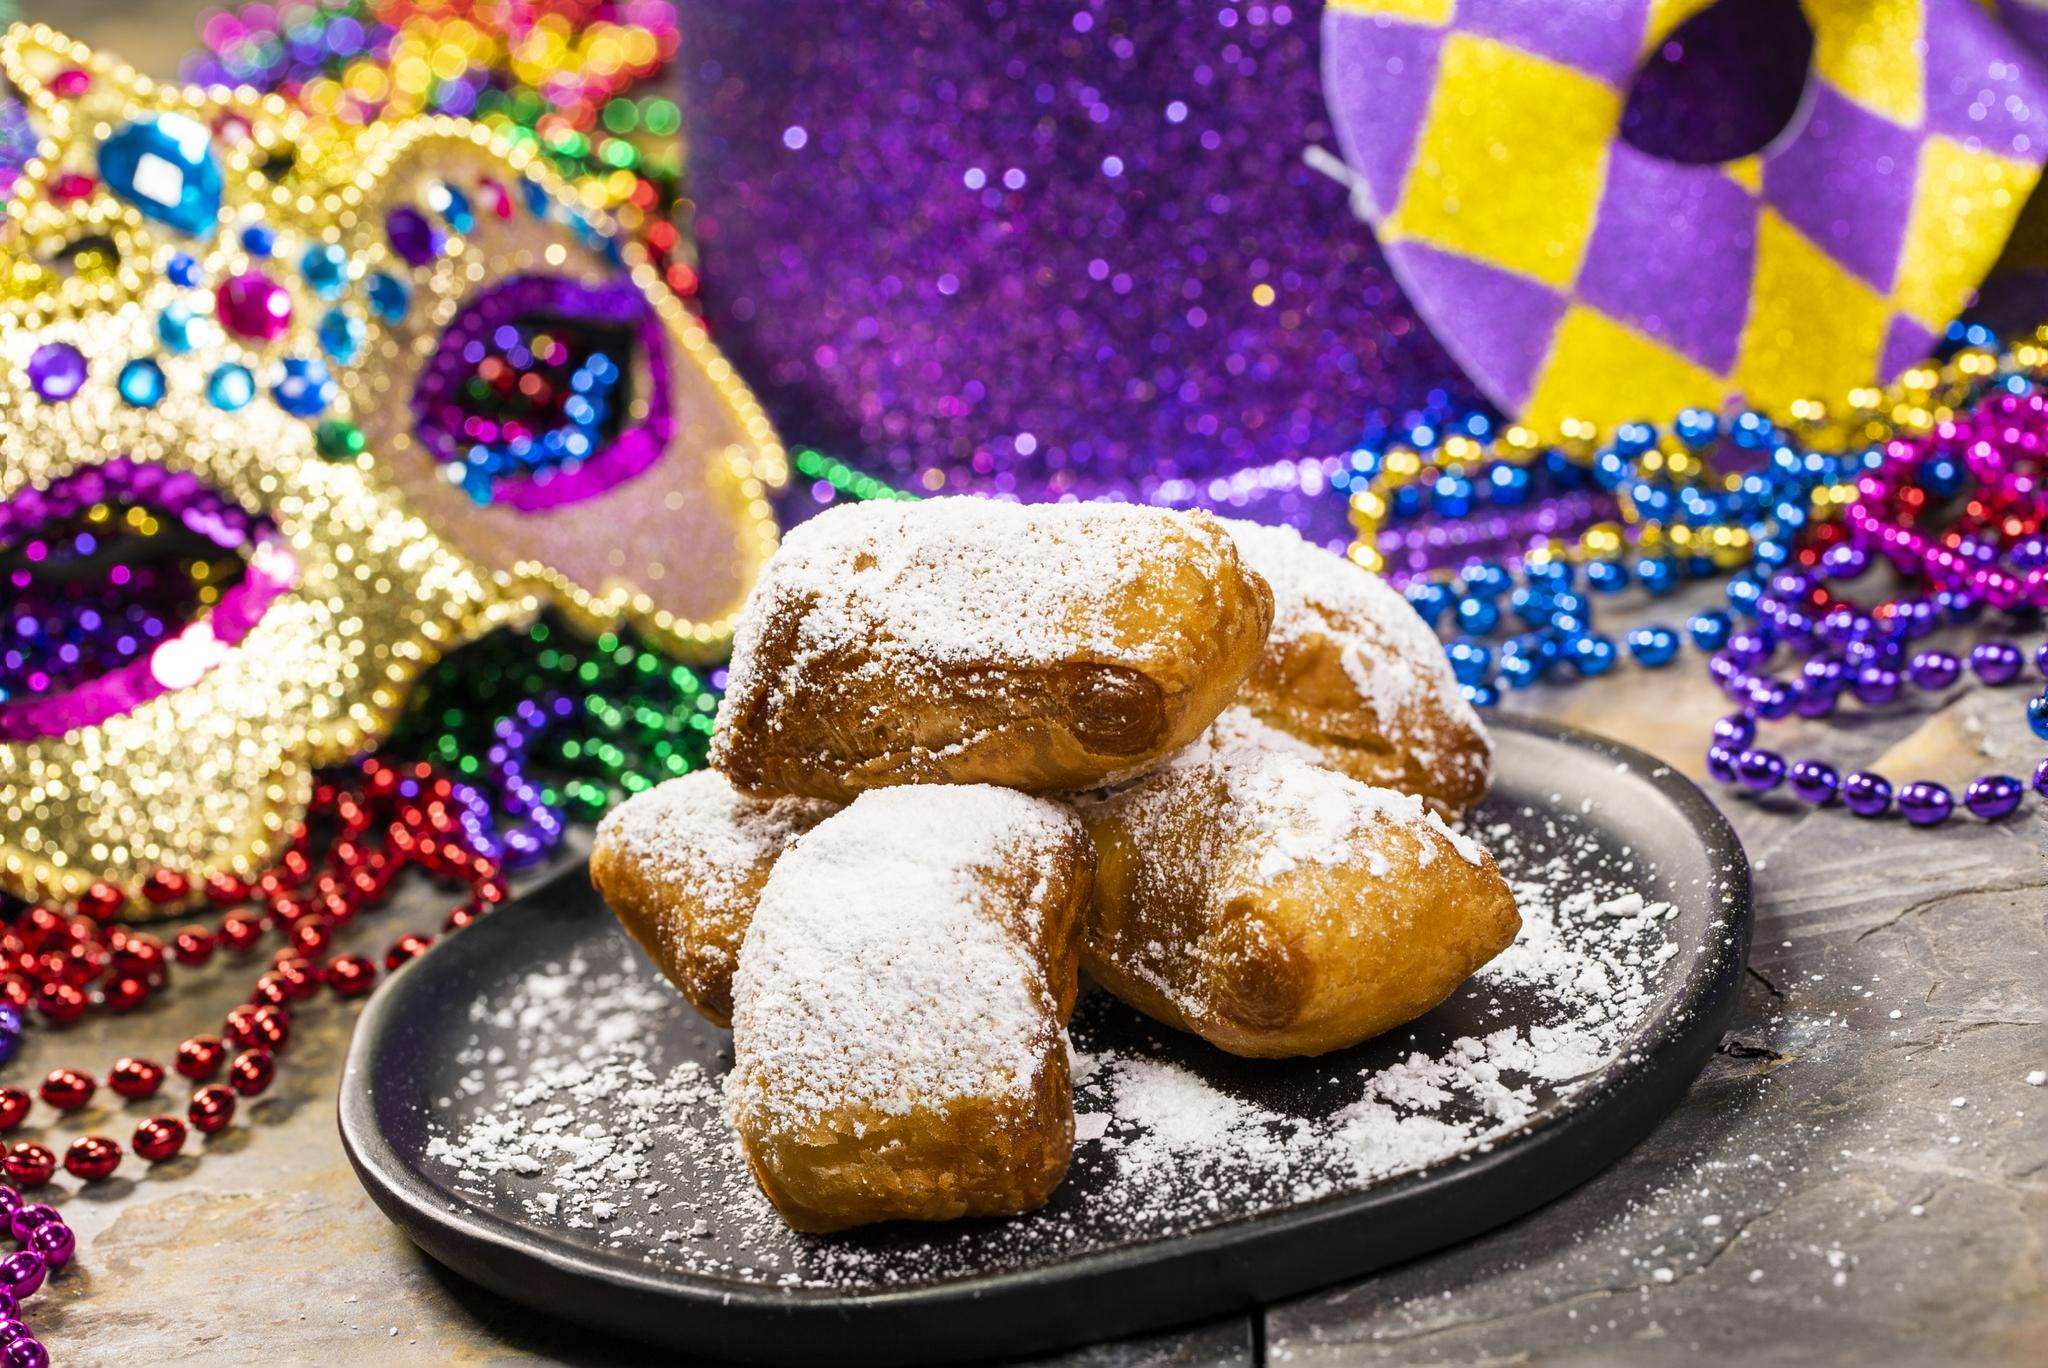 Hot and fresh beignets are a festival staple for Busch Gardens' Mardi Gras